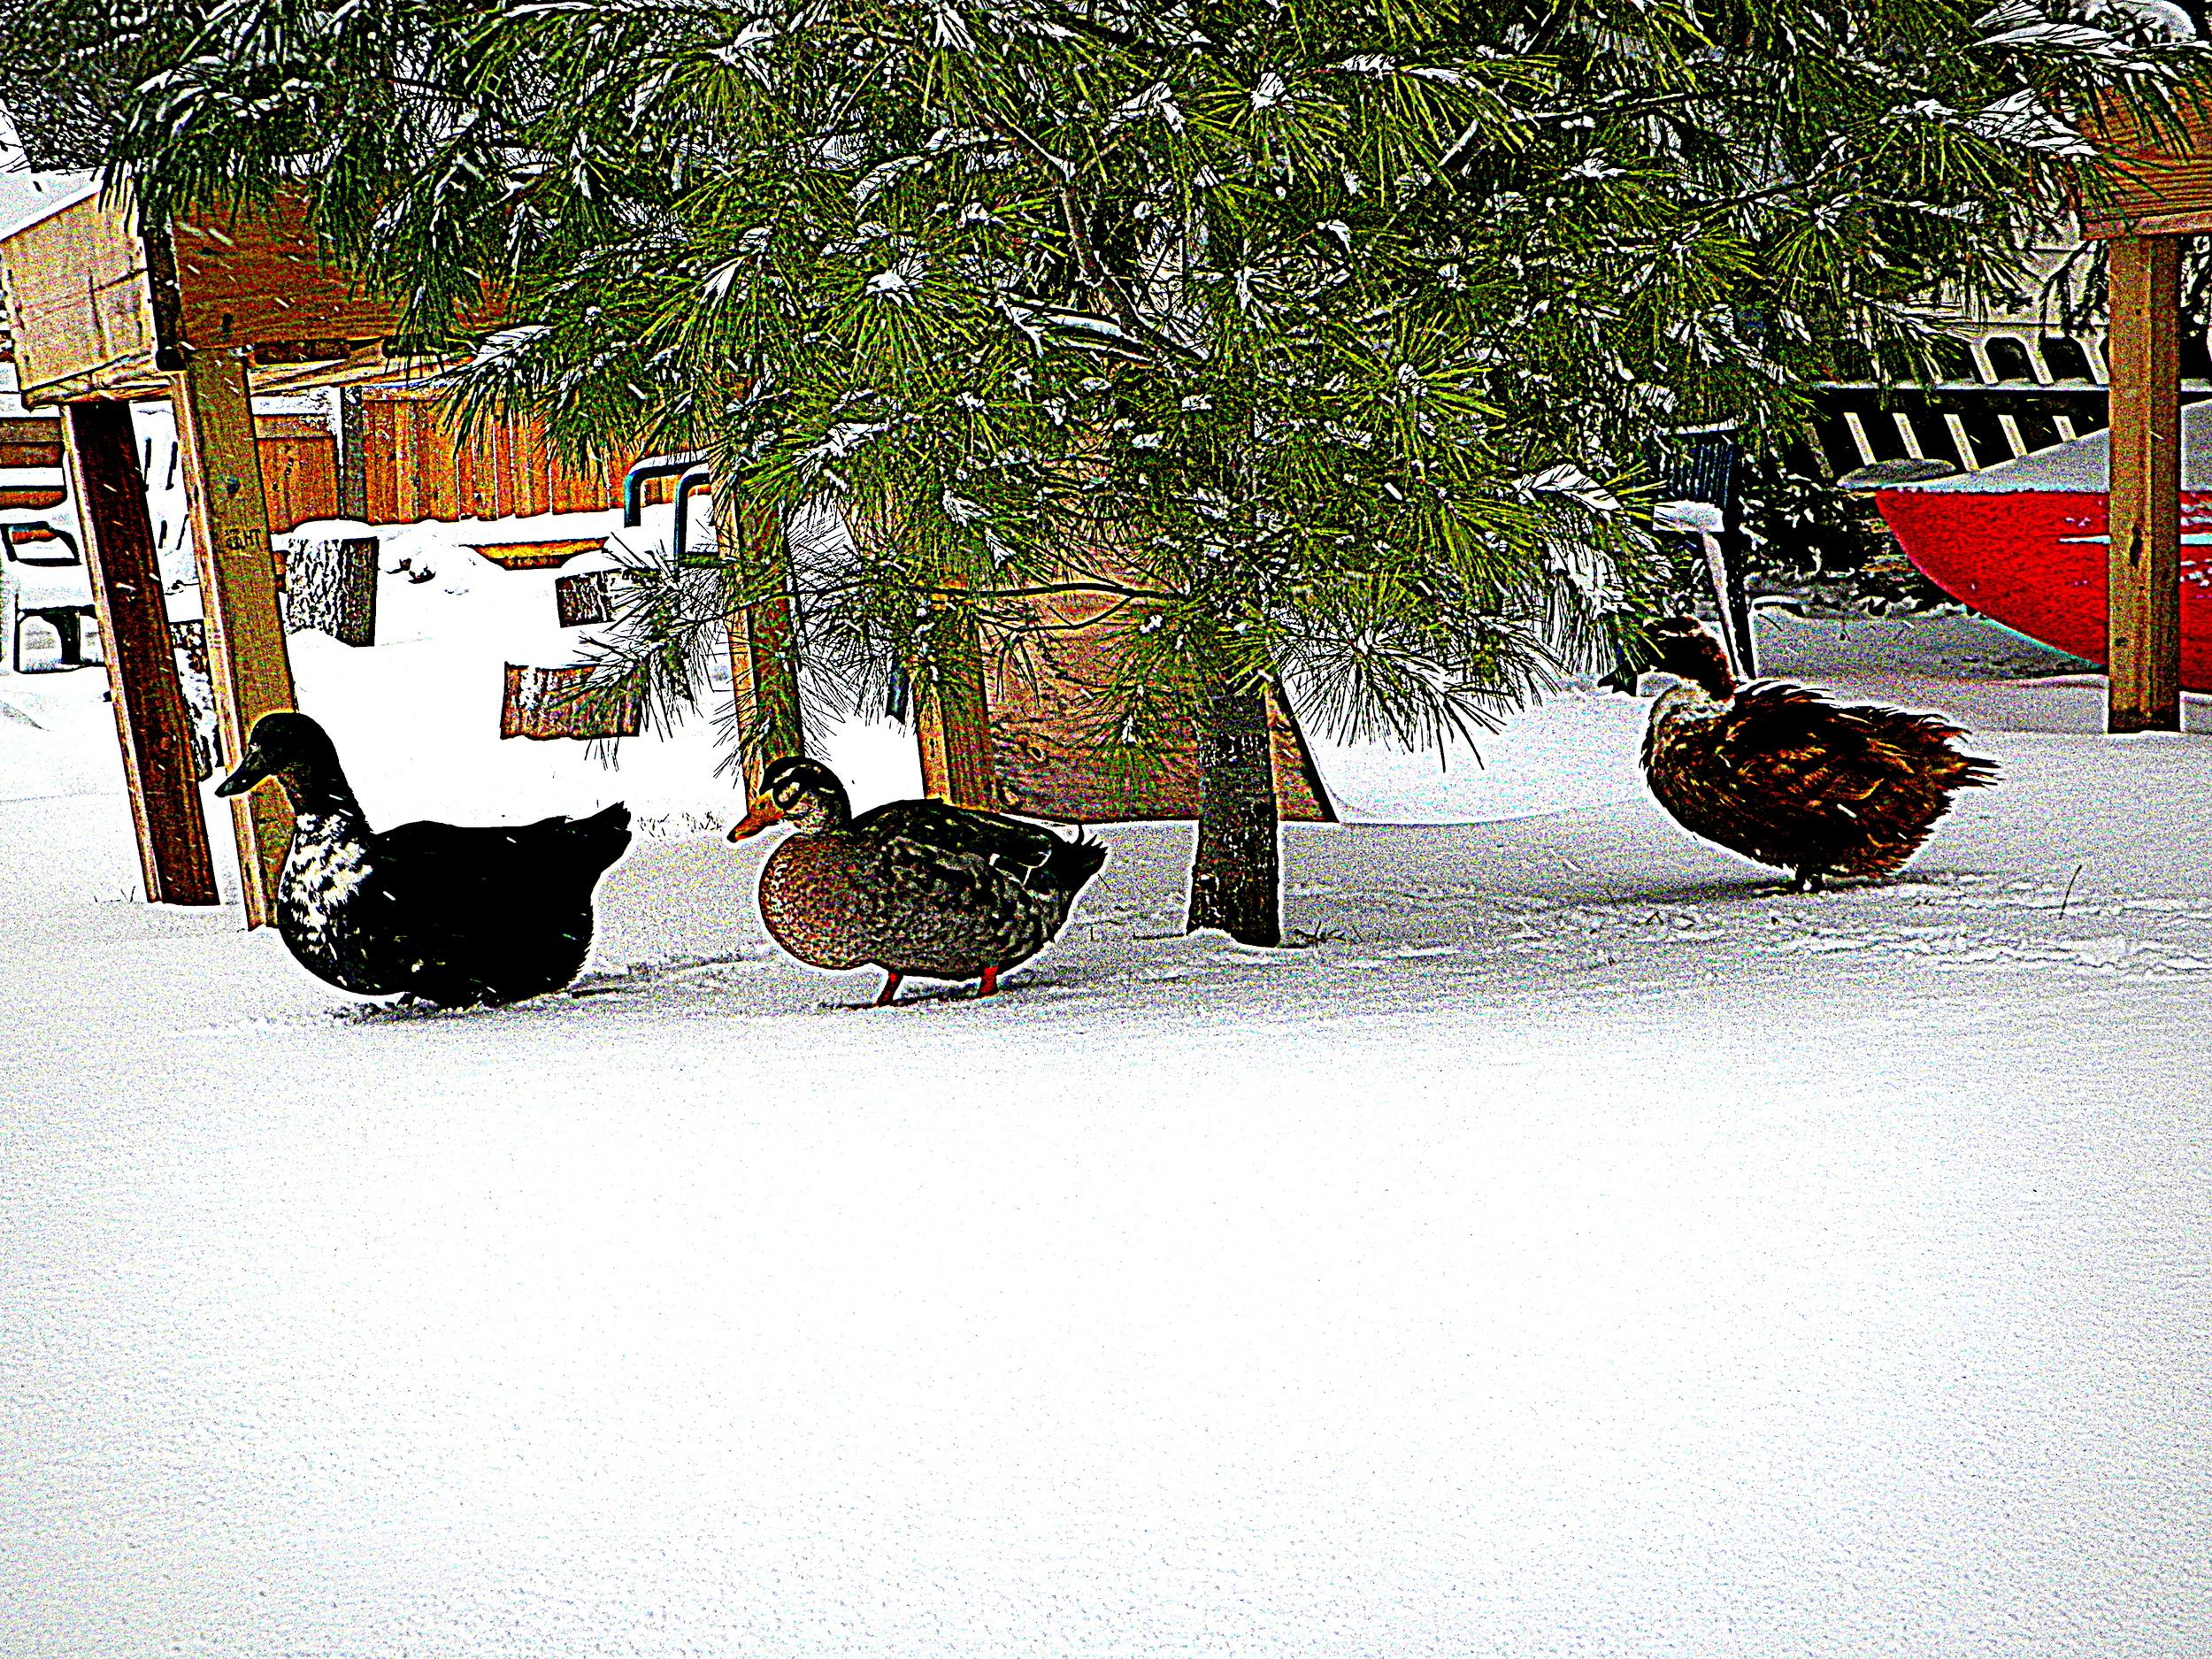 Ducks winter III  1-30-13.JPG